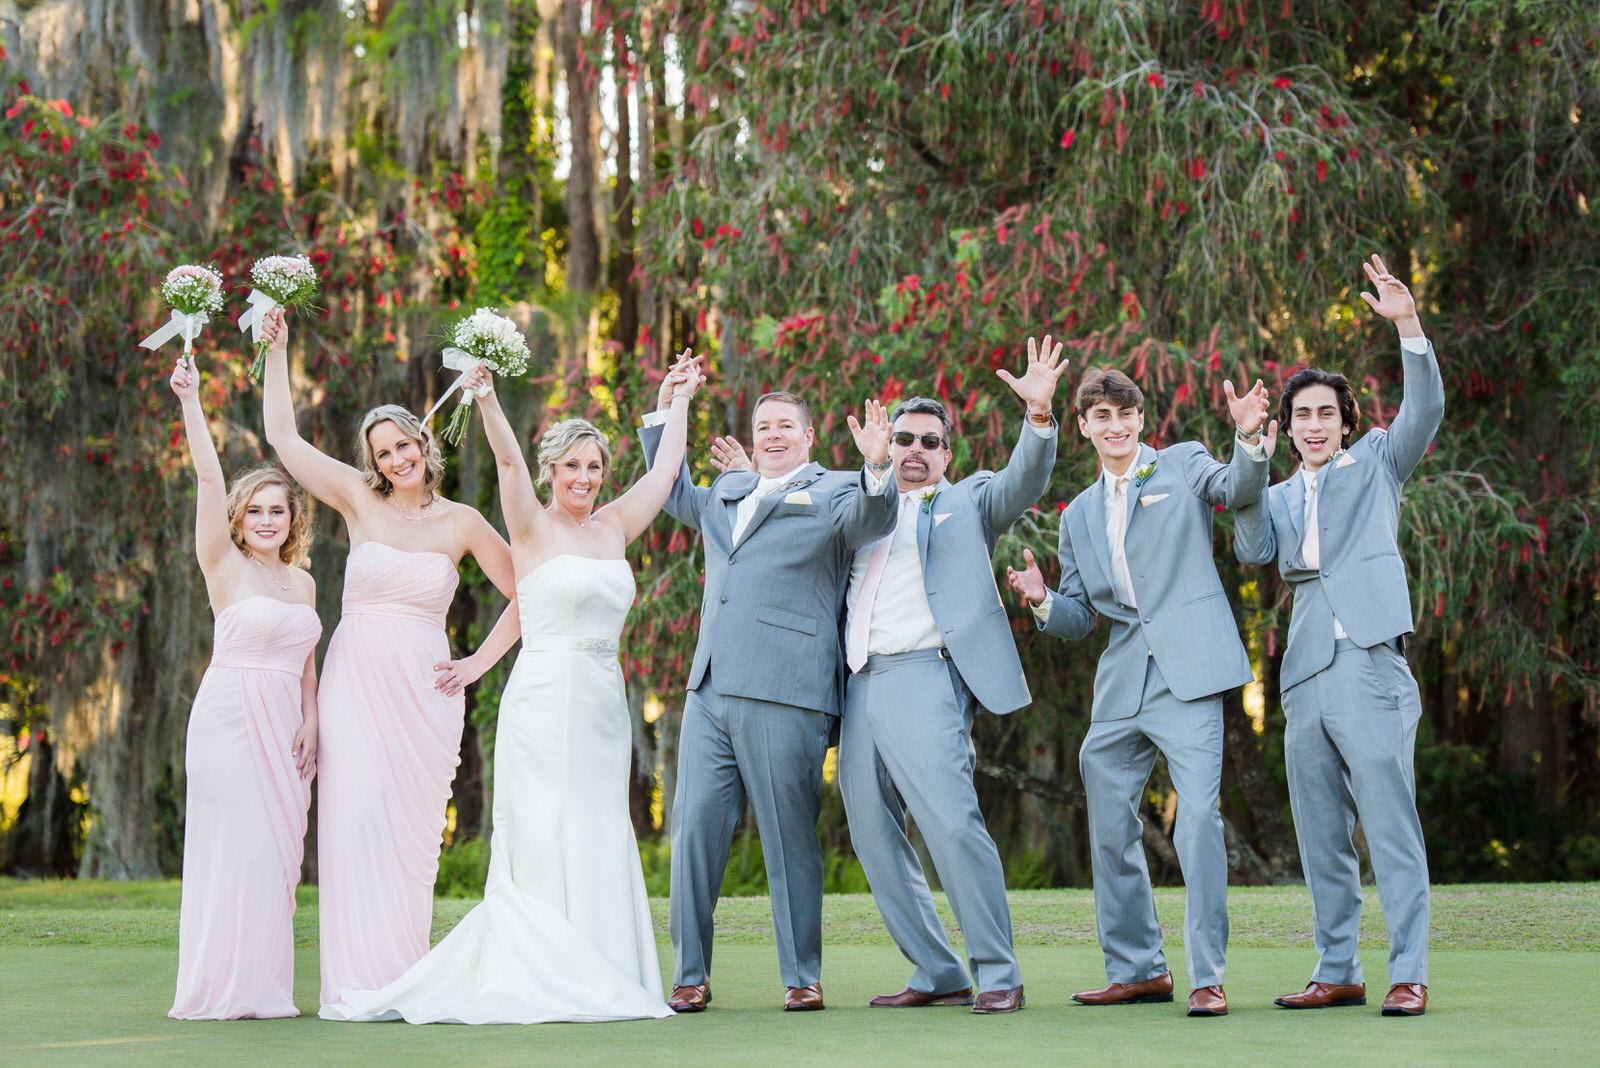 Mike_&_Barbaras_Wedding_3_24_2018-202.jpg